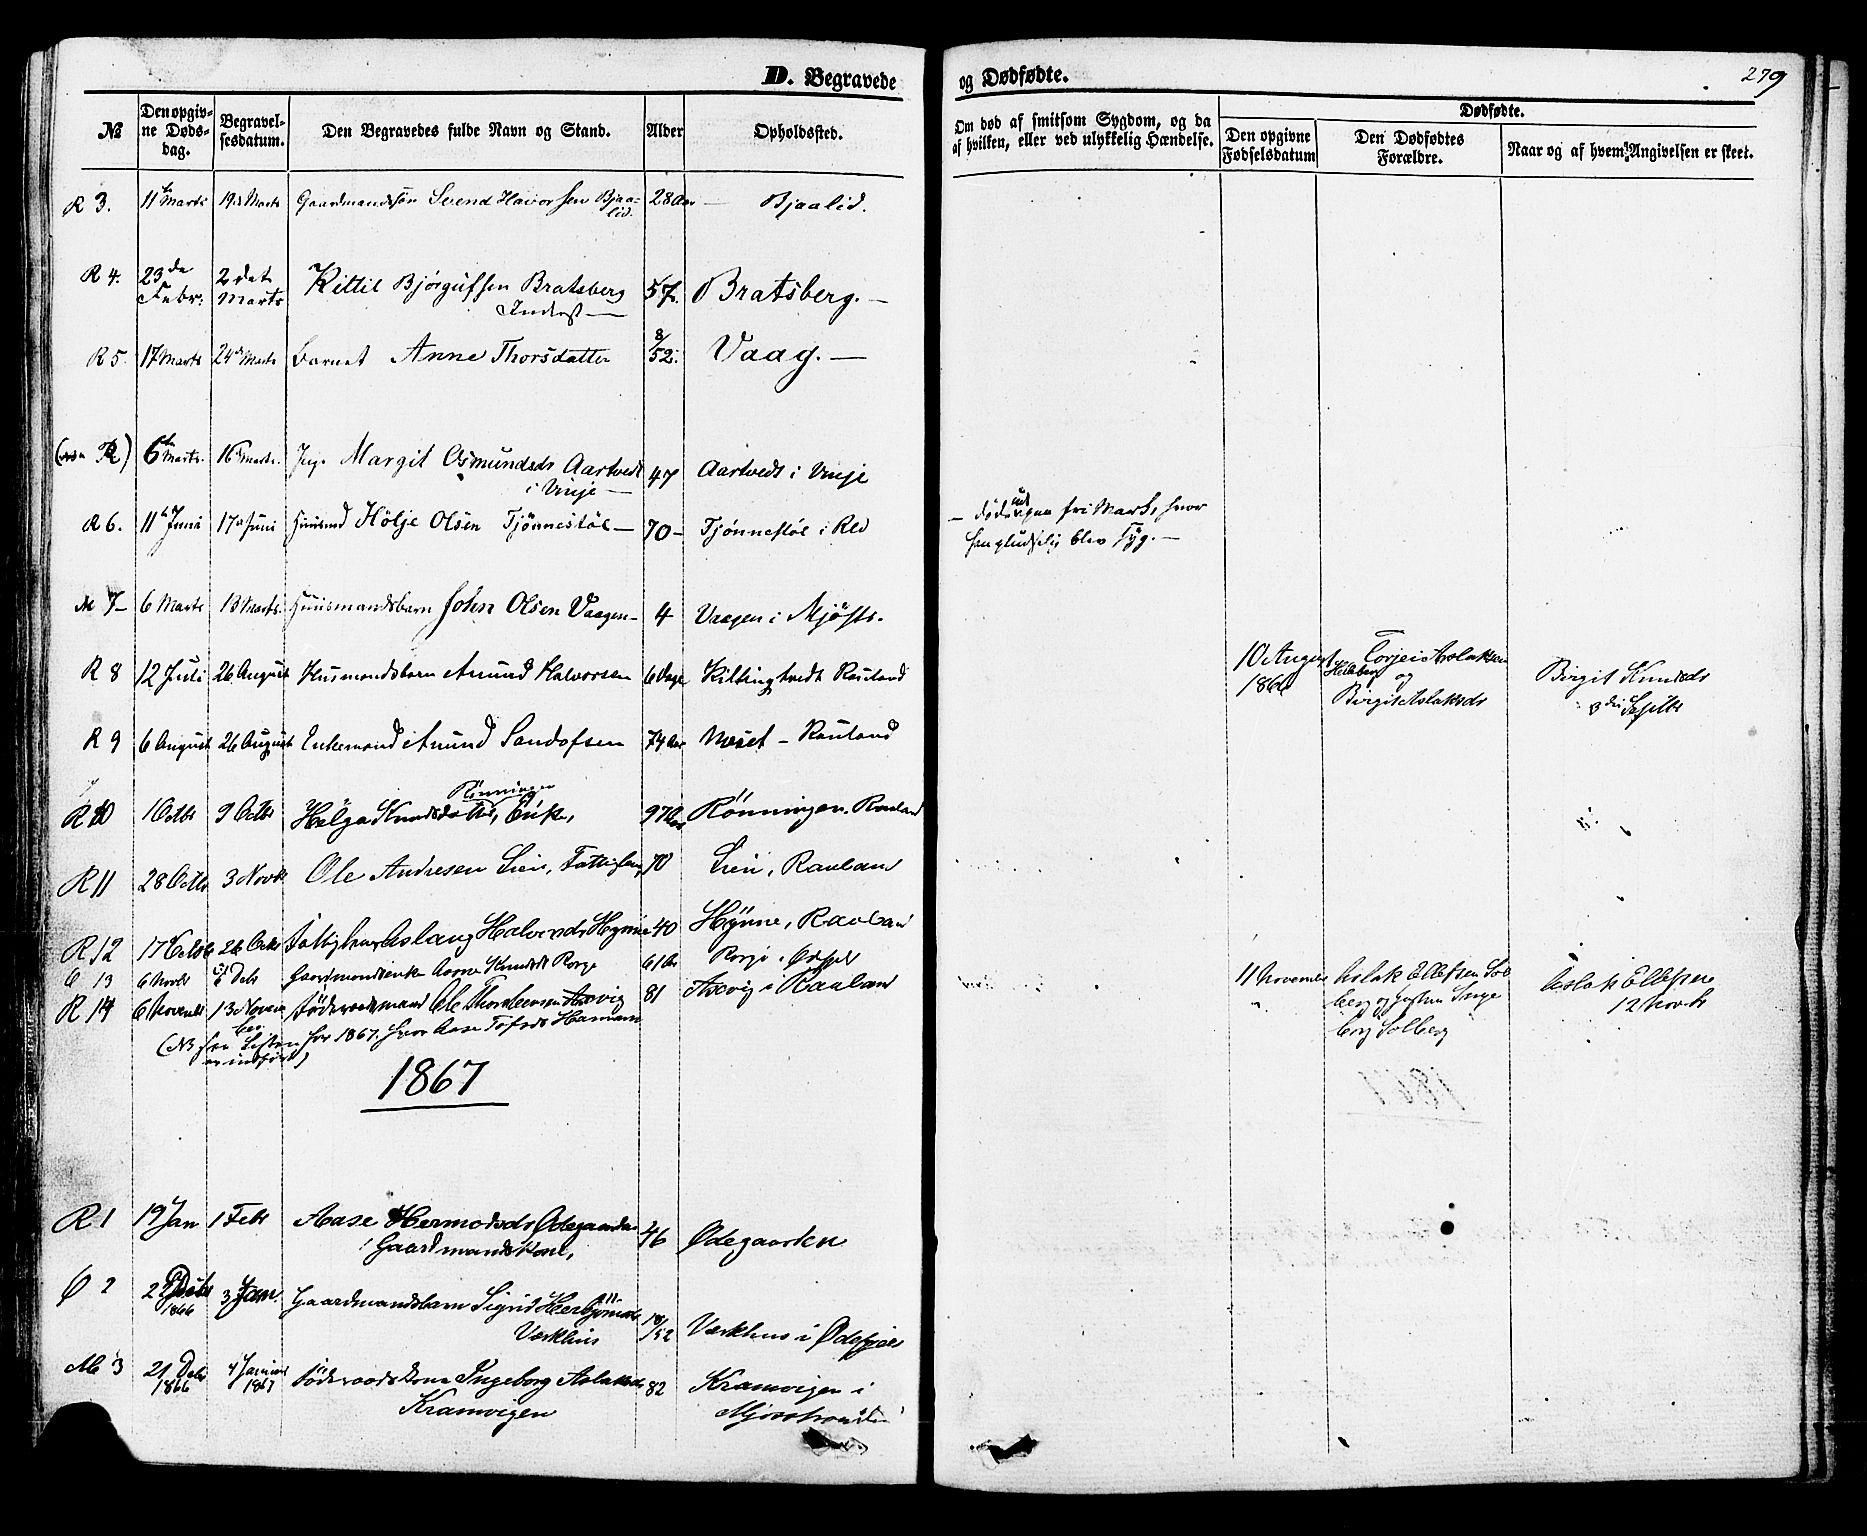 SAKO, Rauland kirkebøker, F/Fa/L0003: Ministerialbok nr. 3, 1859-1886, s. 279